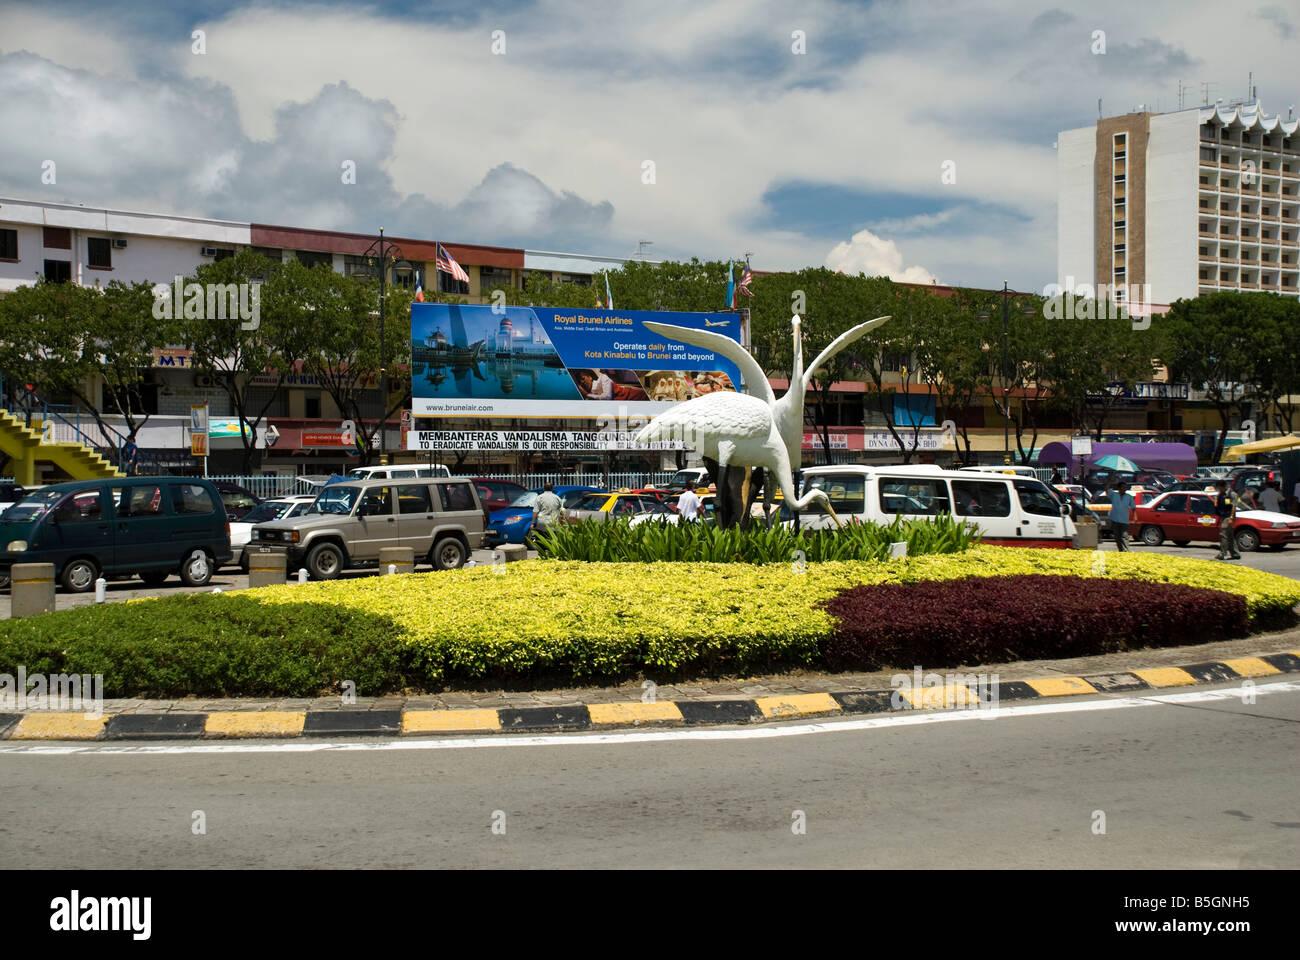 Kota Kinabalu City Scene - Stock Image